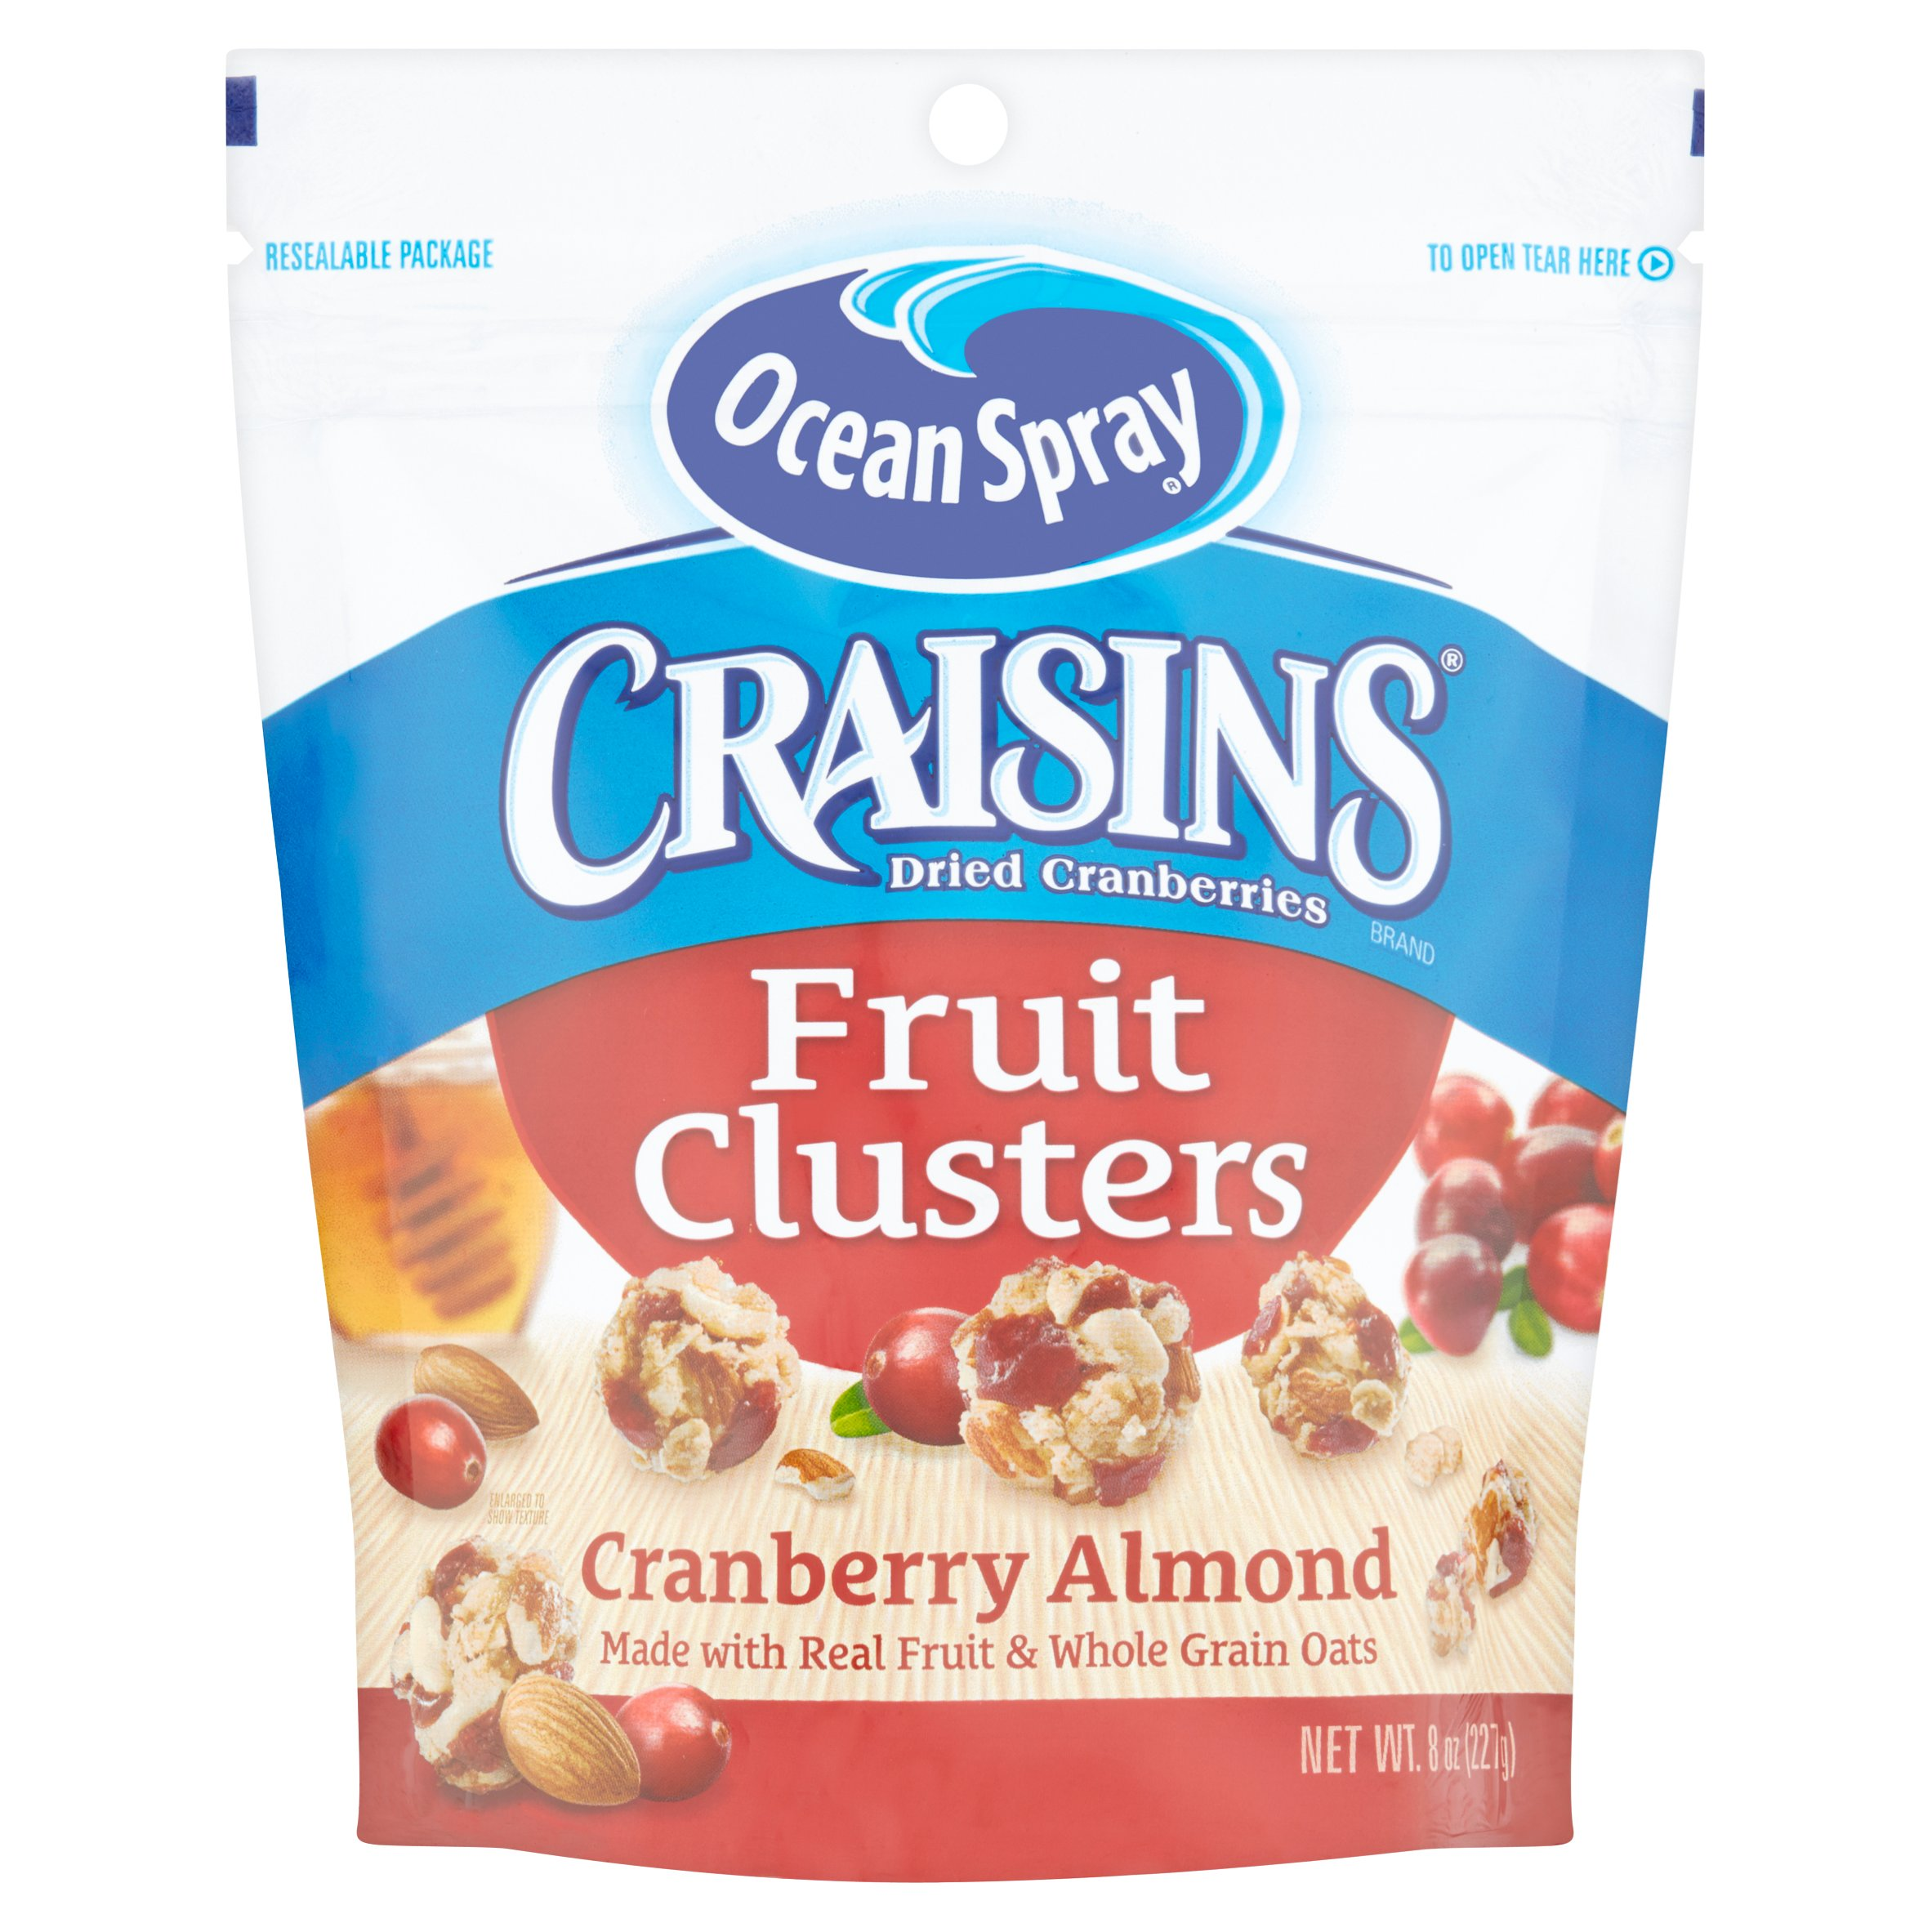 Craisins Cranberry Almond Dried Cranberries Fruit Clusters 8 oz. Bag by Ocean Spray Cranberries, Inc.